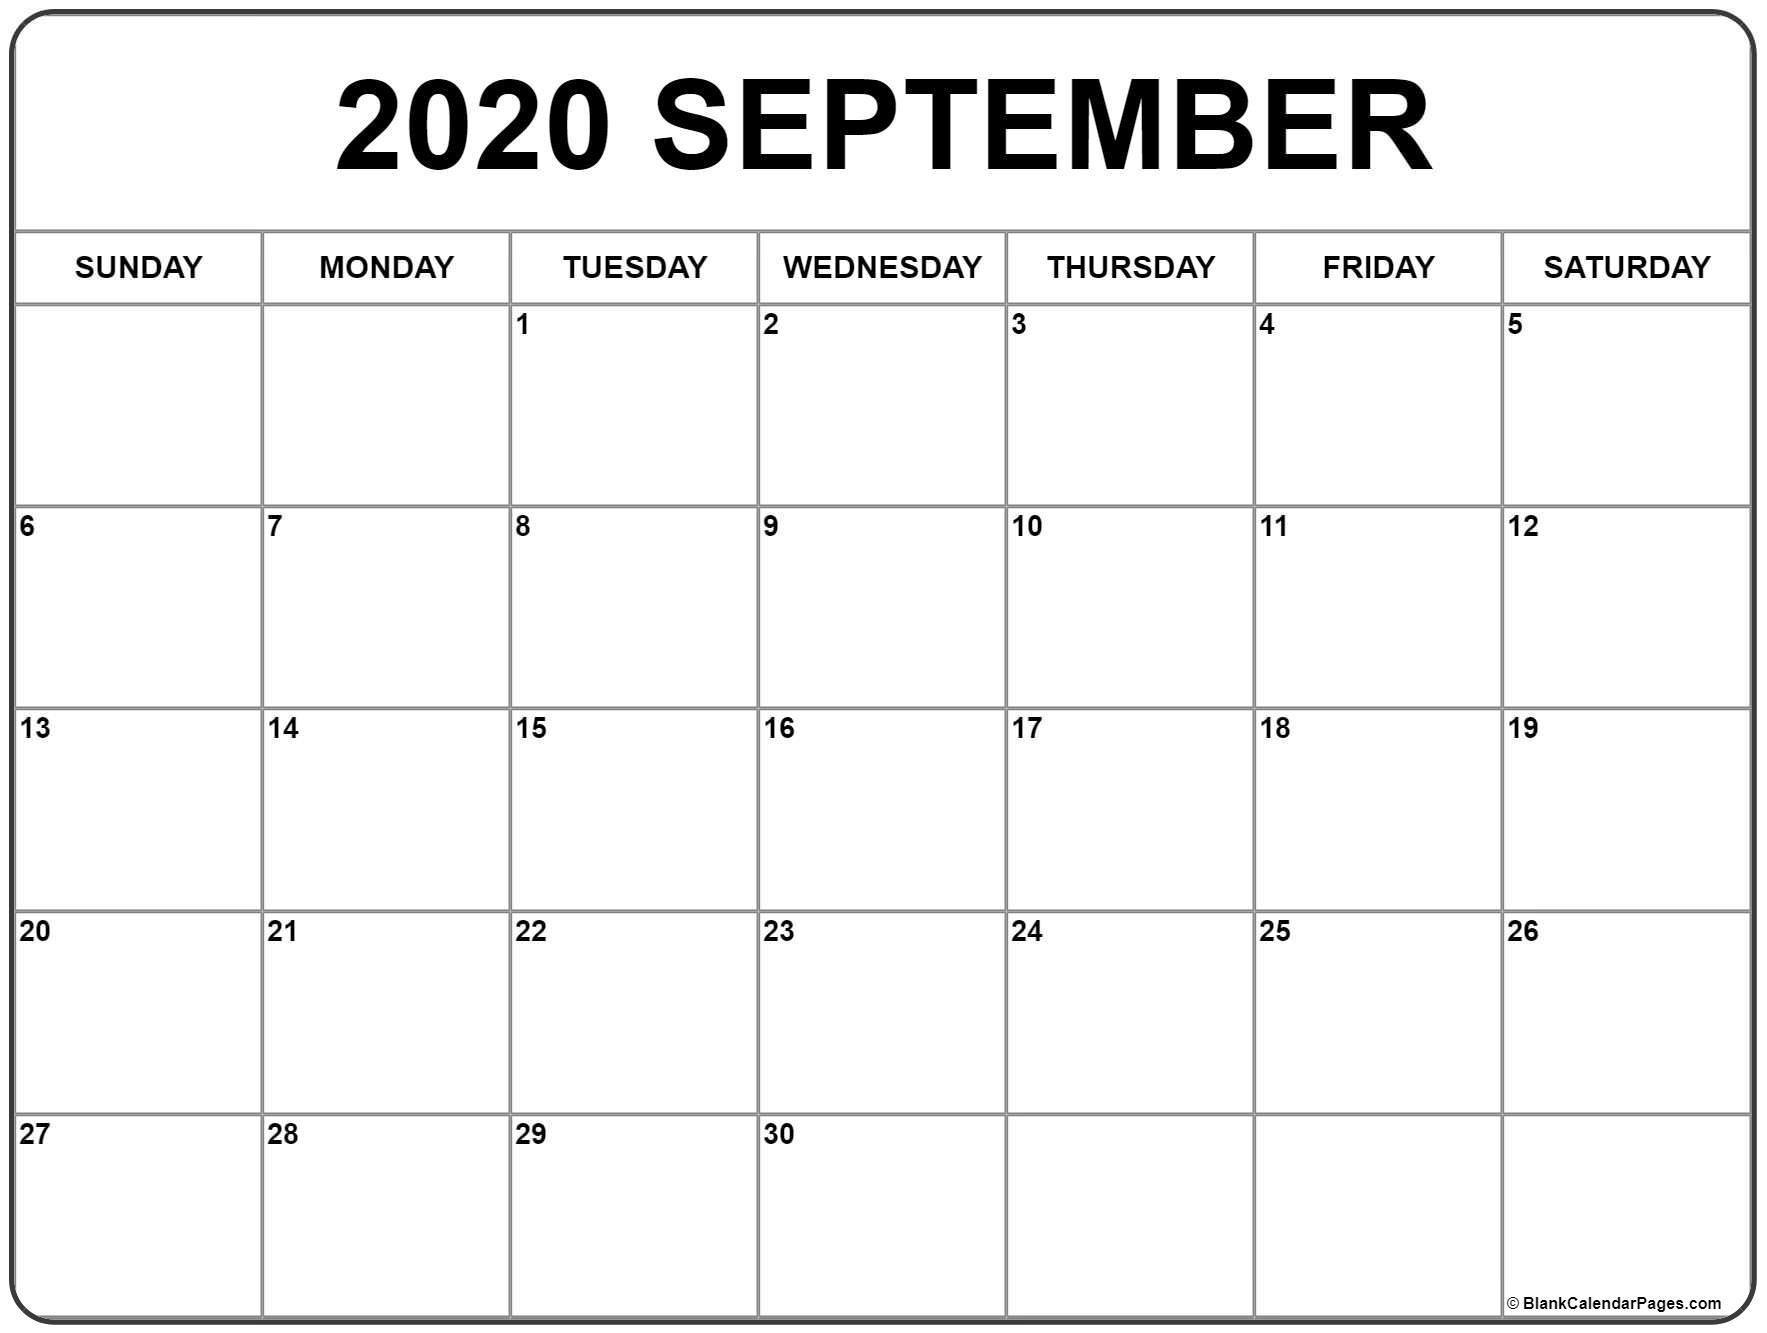 September 2020 Calendar | Free Printable Monthly Calendars intended for Empty Calendar Printable